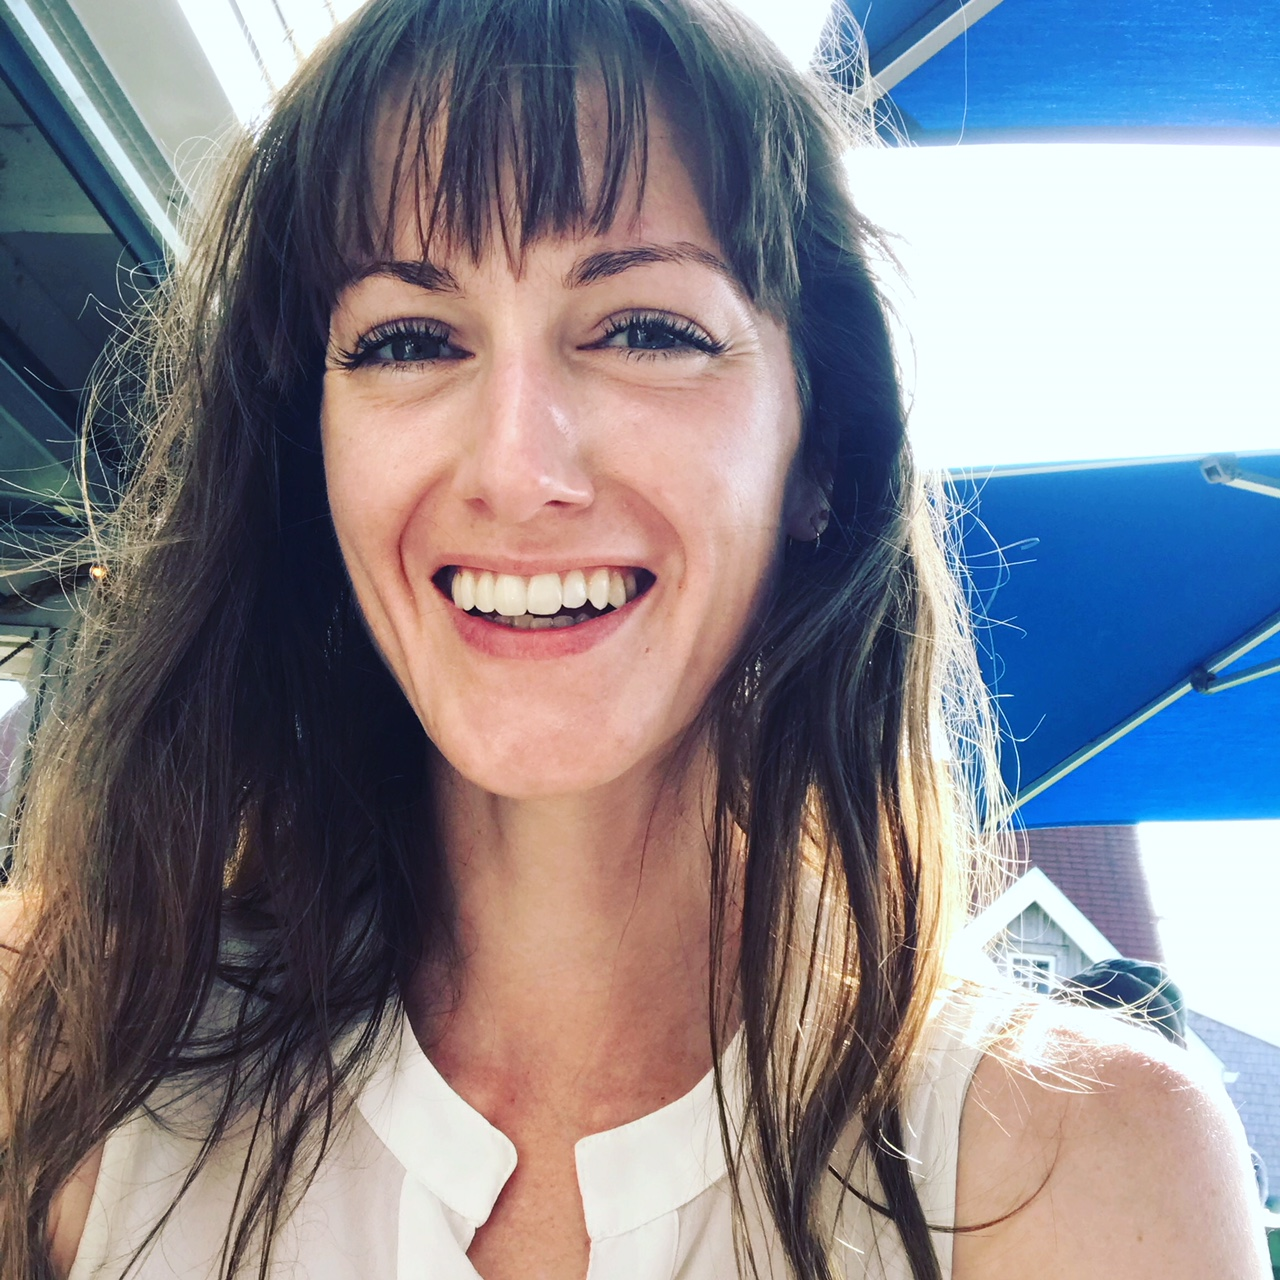 Brianne Hogan smiling